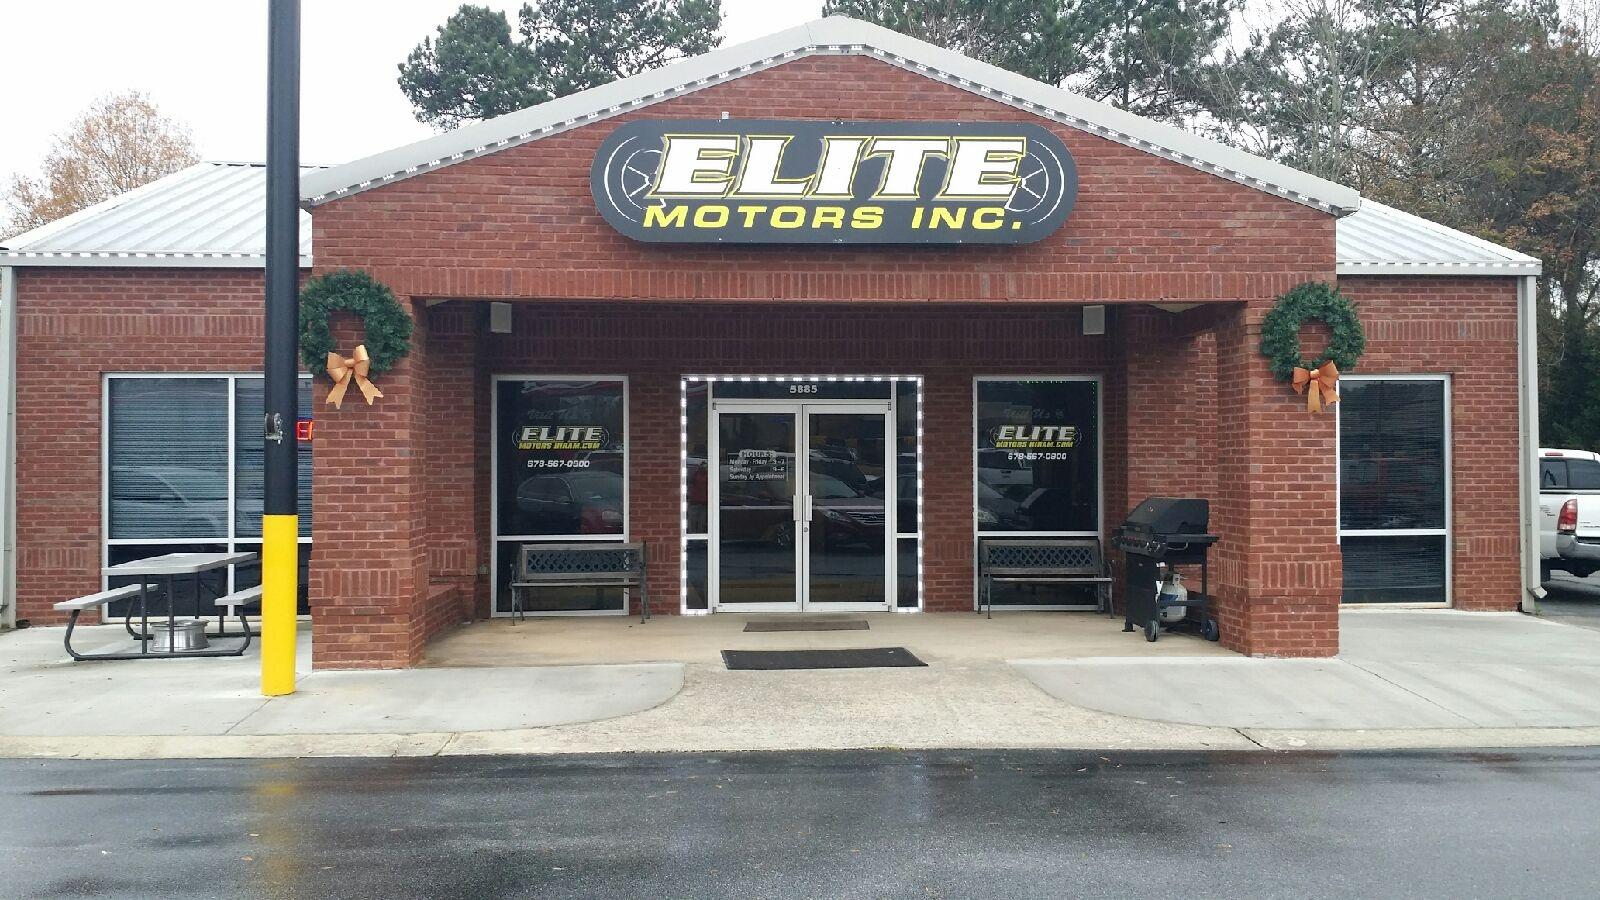 Elite motors hiram hiram ga read consumer reviews for Elite motors inc hiram ga